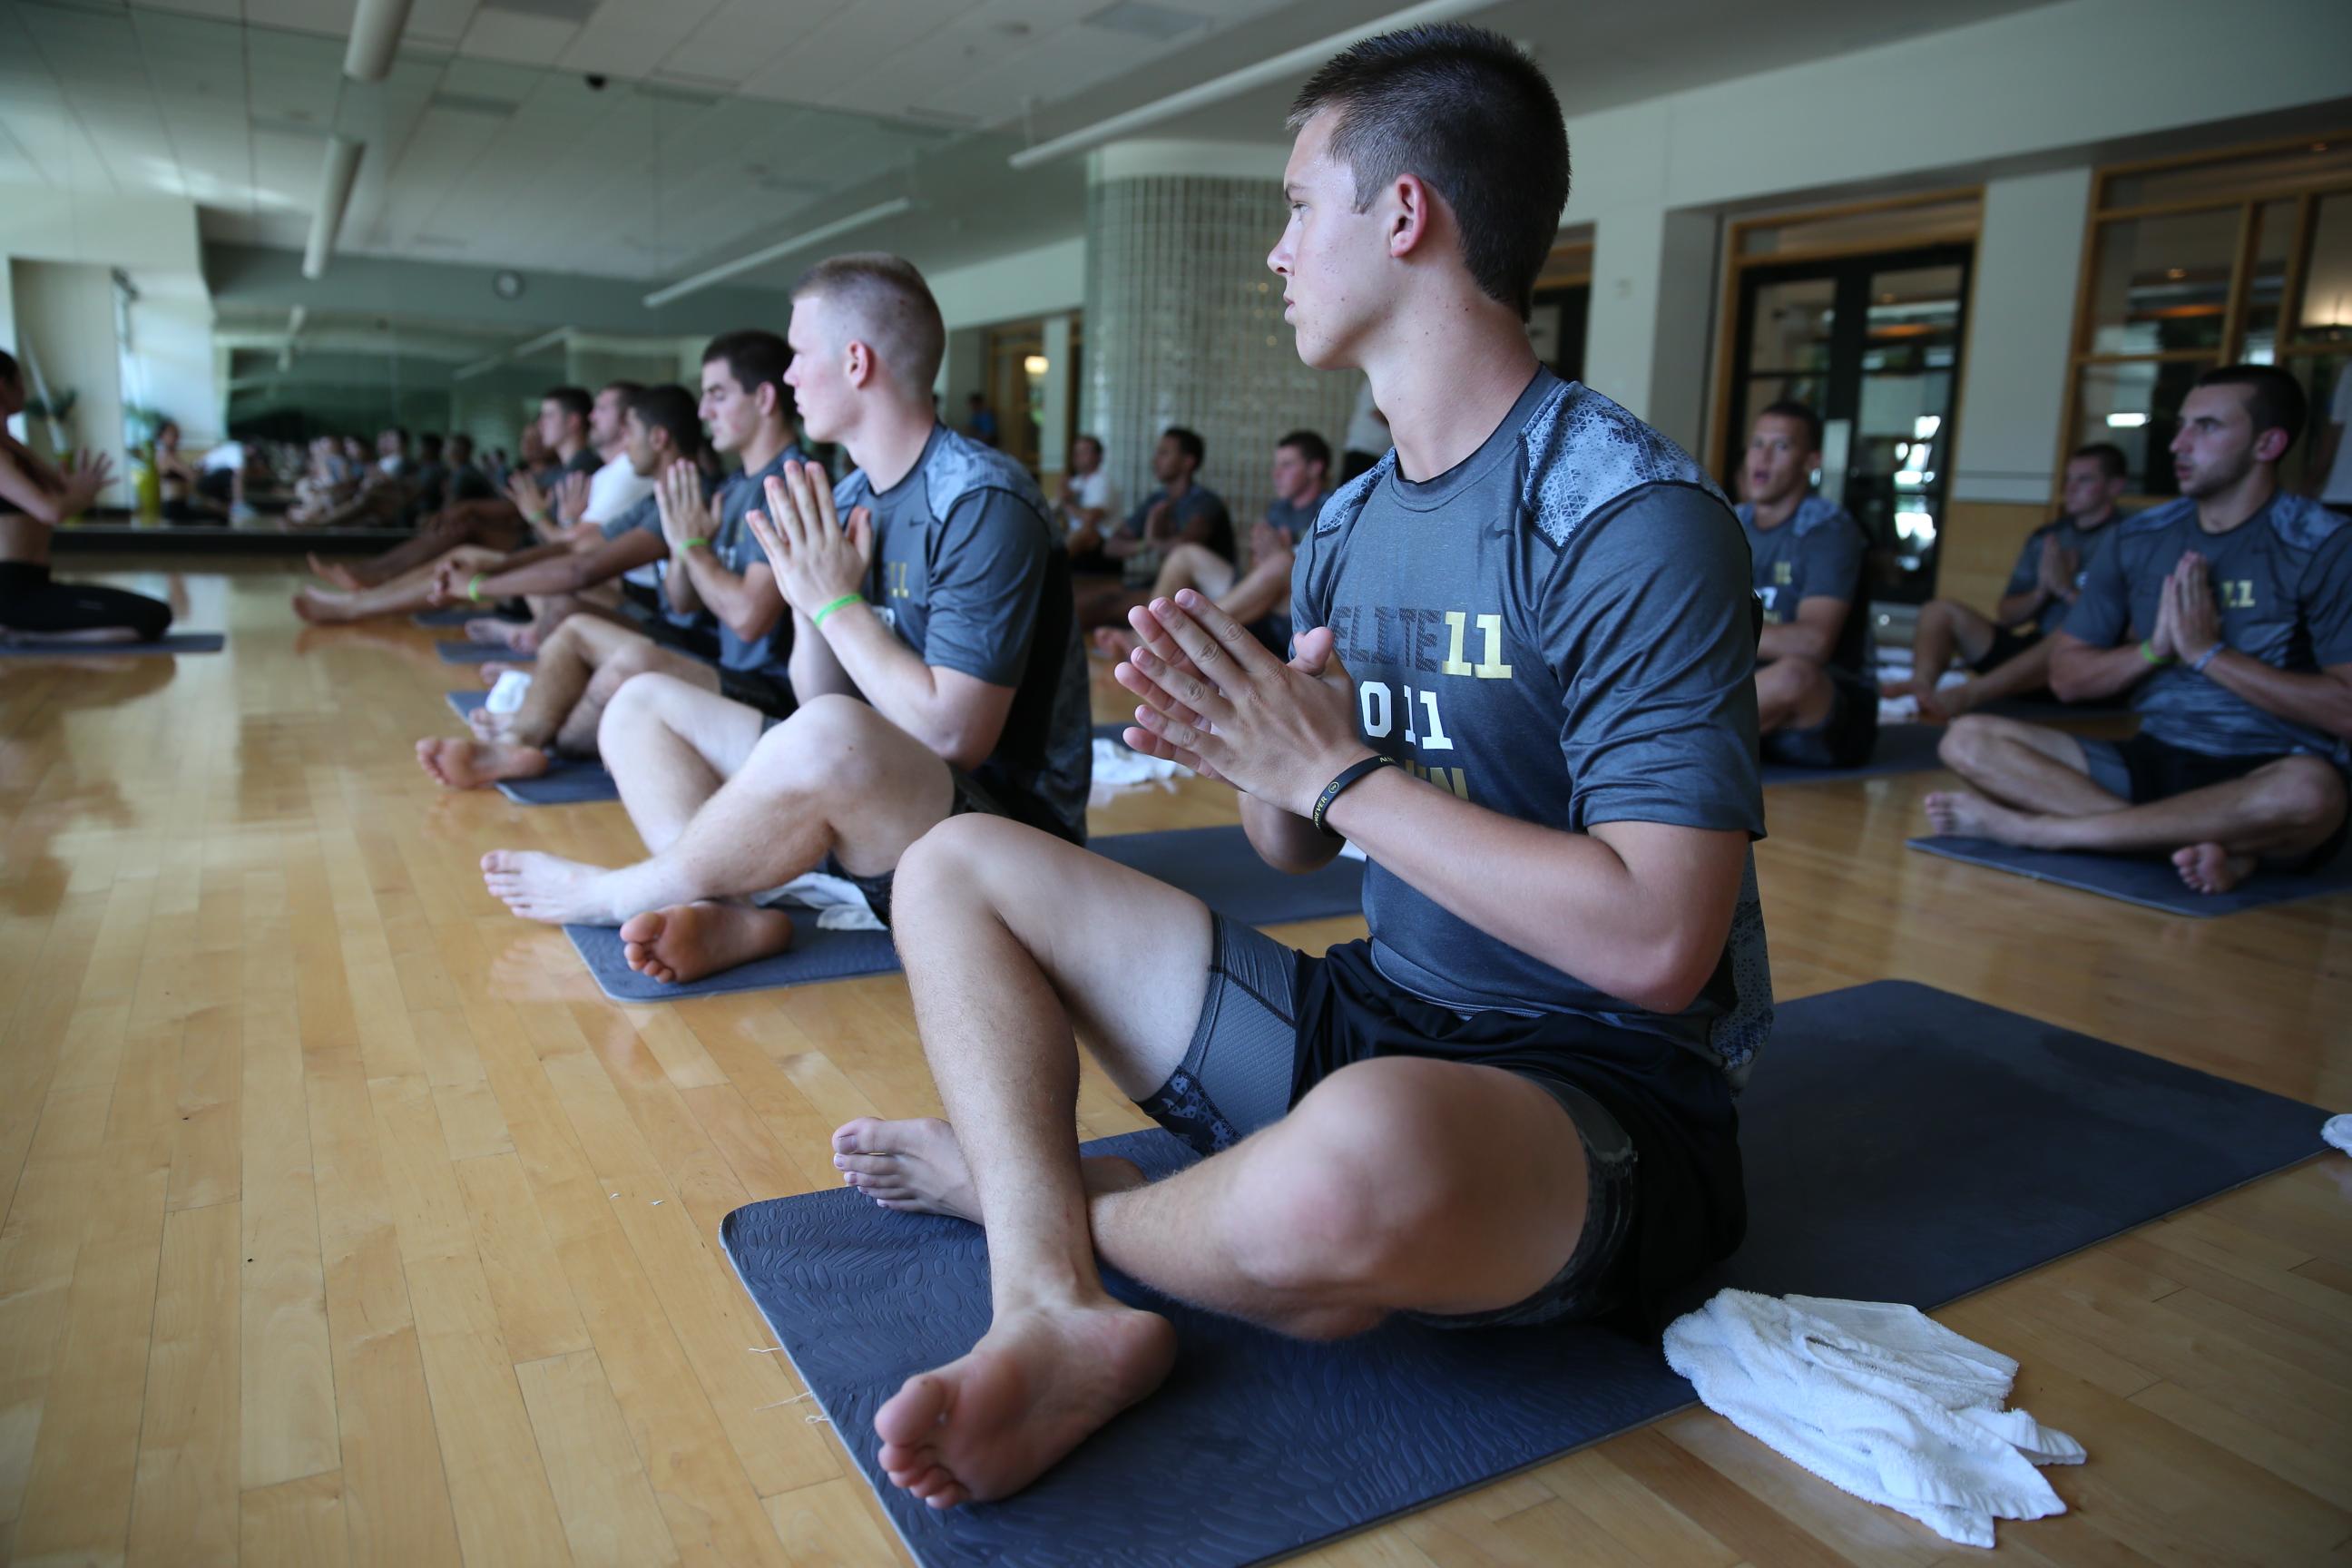 Elite 11 Yoga